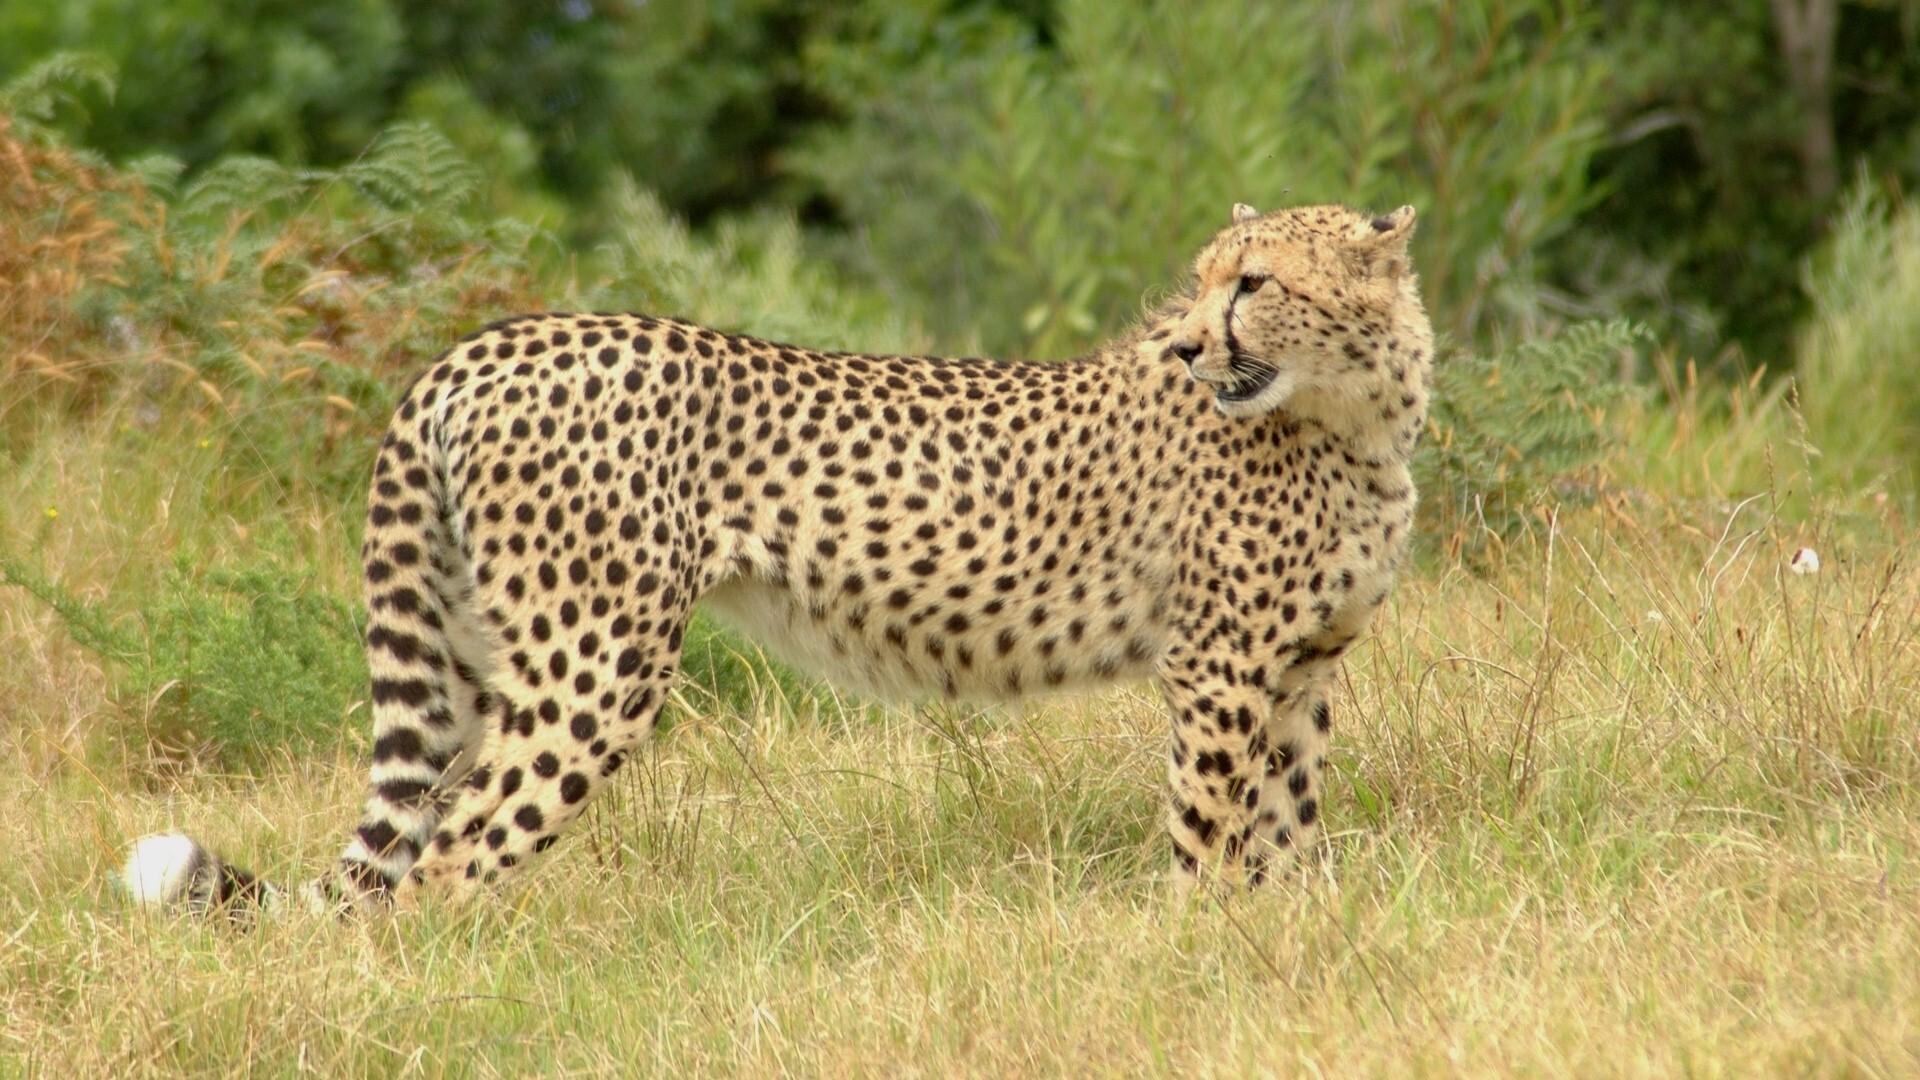 cheetah cute image - HD Desktop Wallpapers | 4k HD